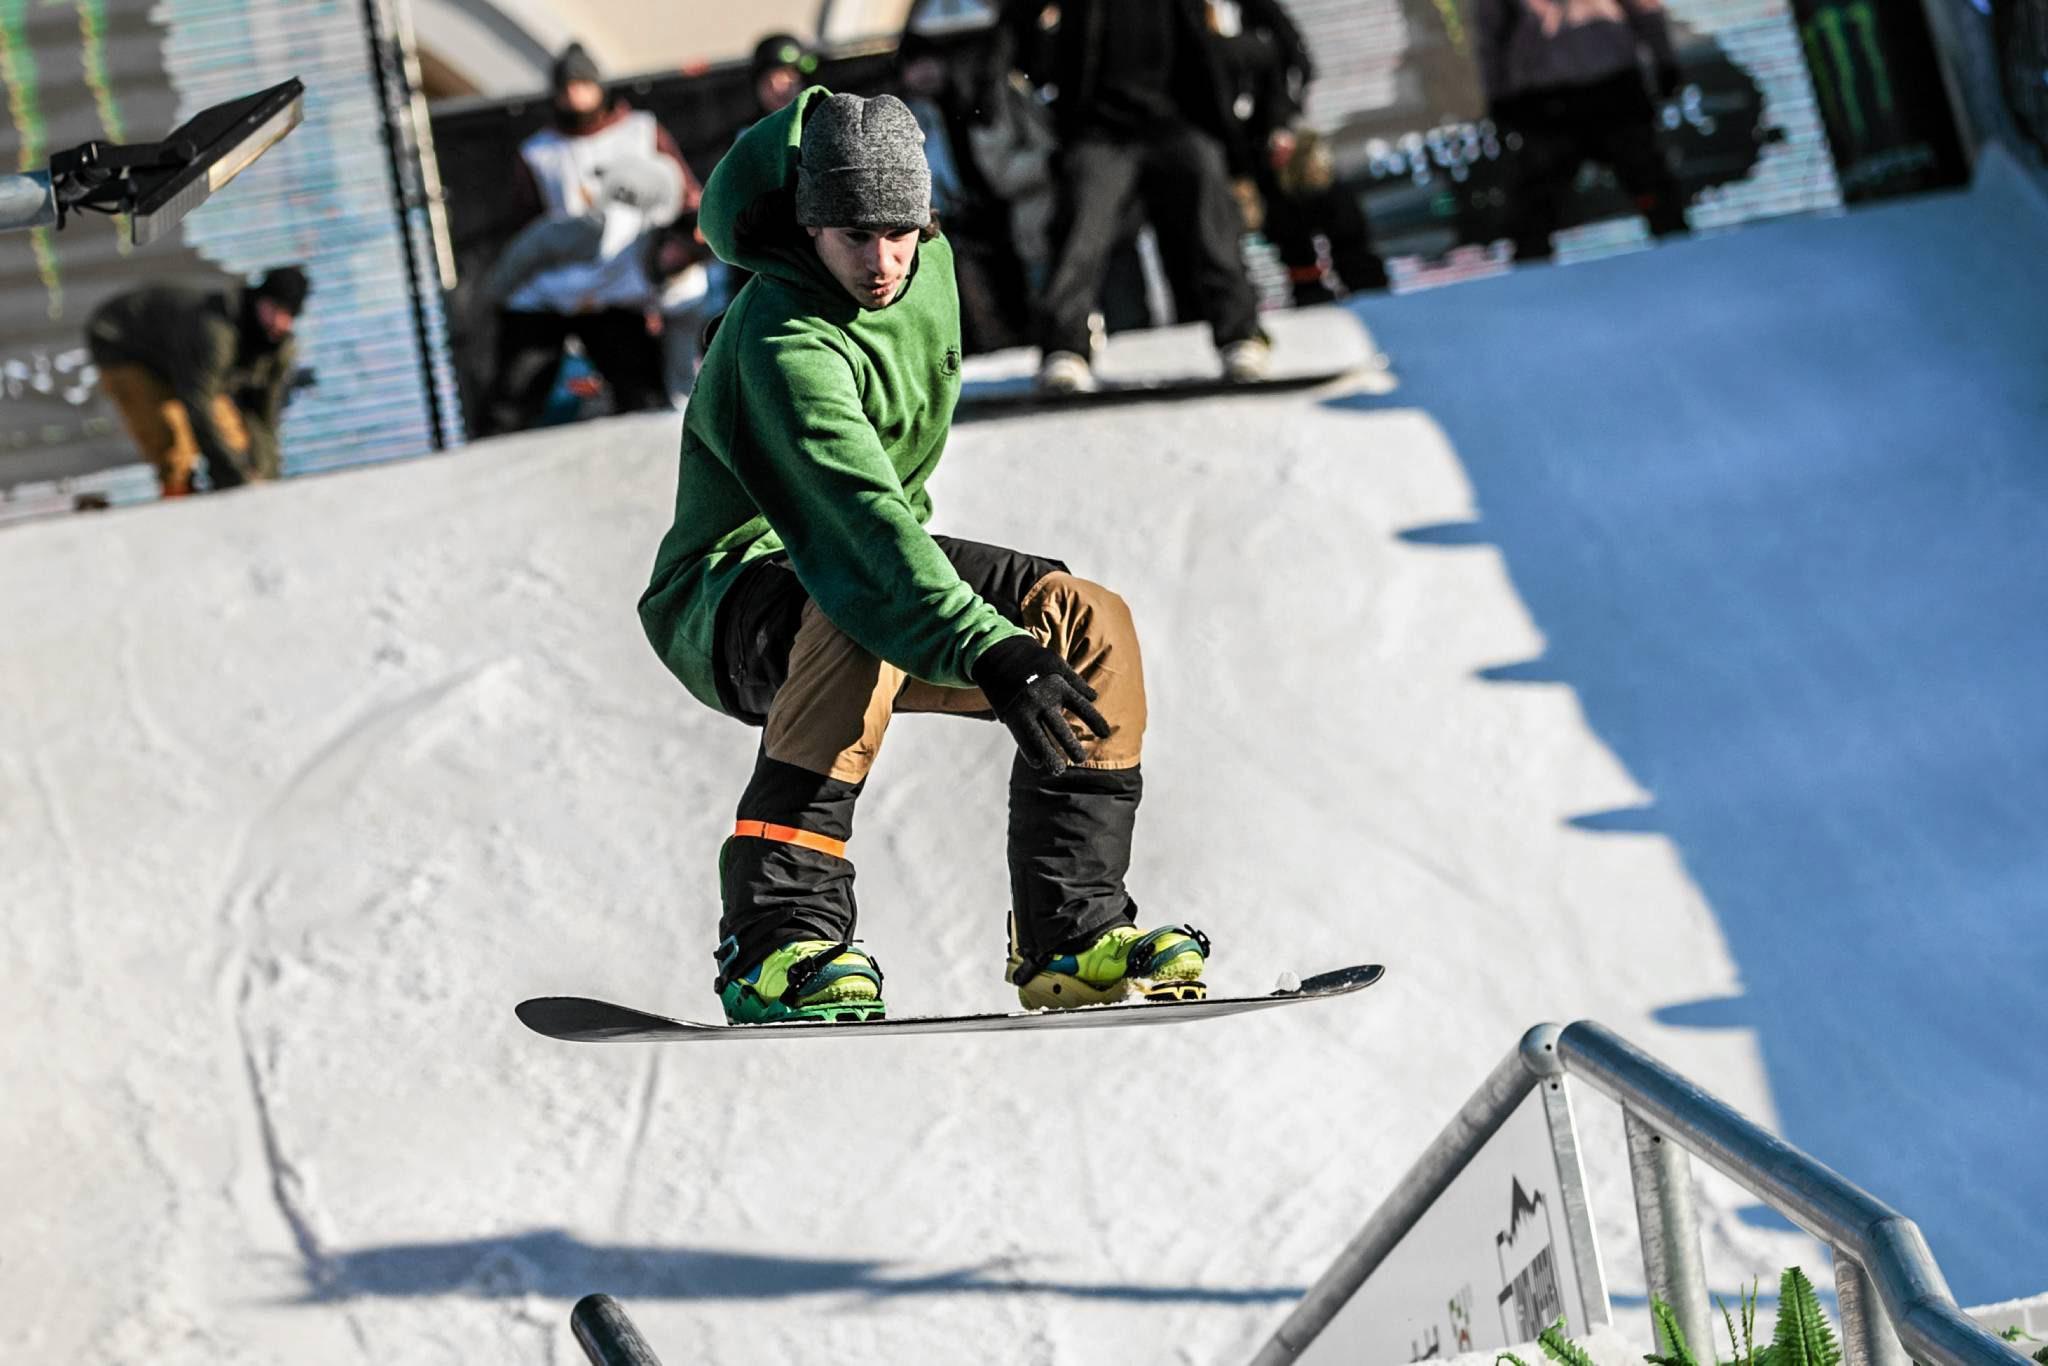 Buty snowboardowe Narty Lublin